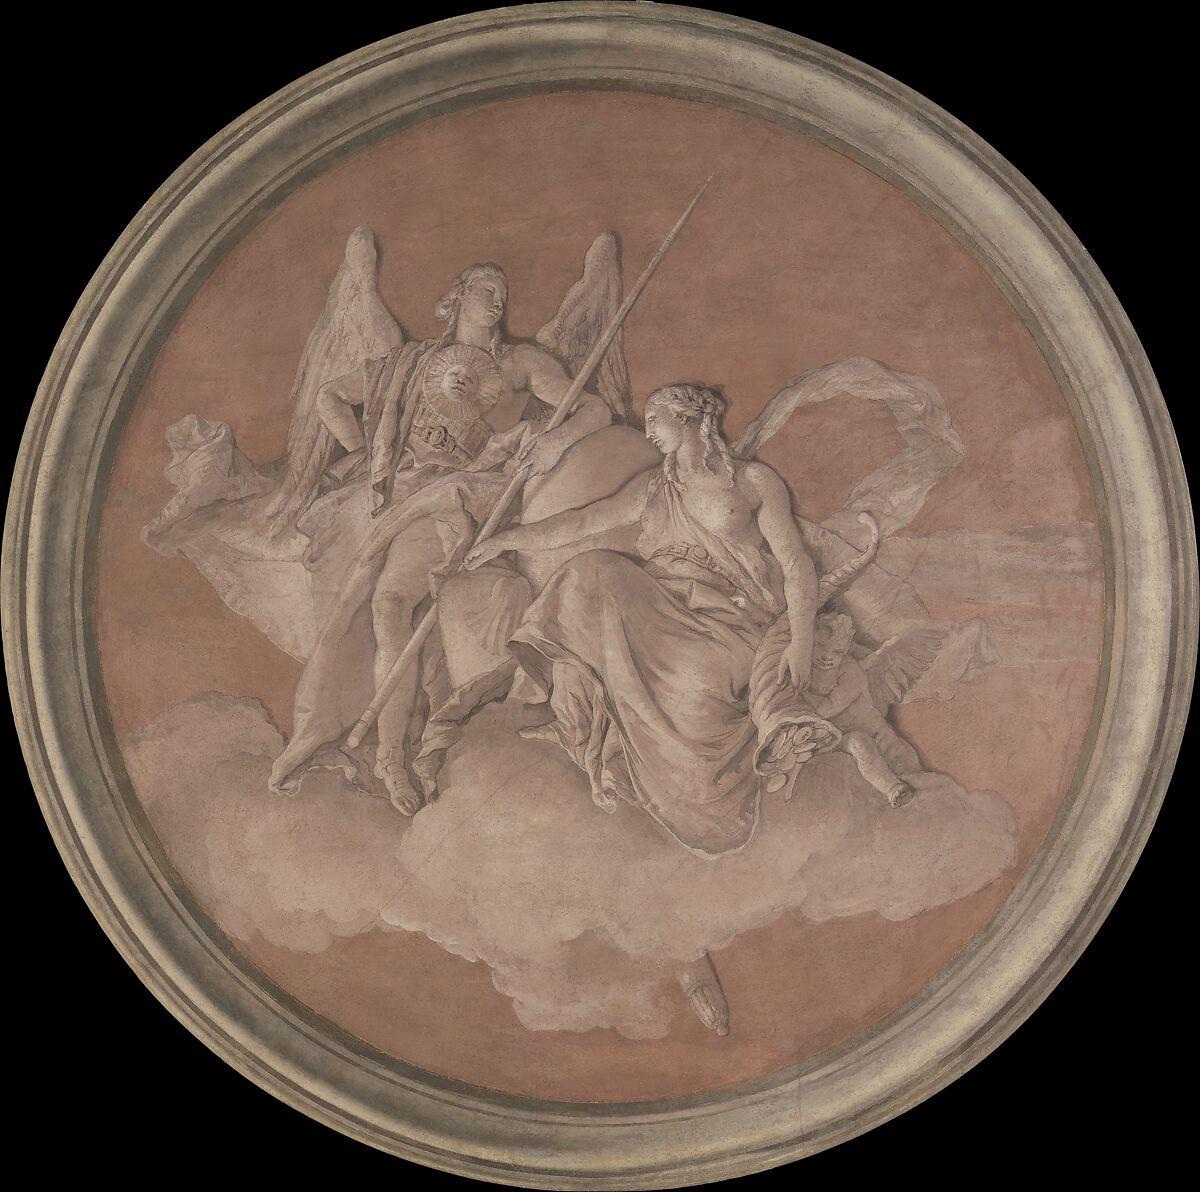 Virtue and Abundance, Giovanni Battista Tiepolo (Italian, Venice 1696–1770 Madrid) and Workshop, Fresco, transferred to canvas